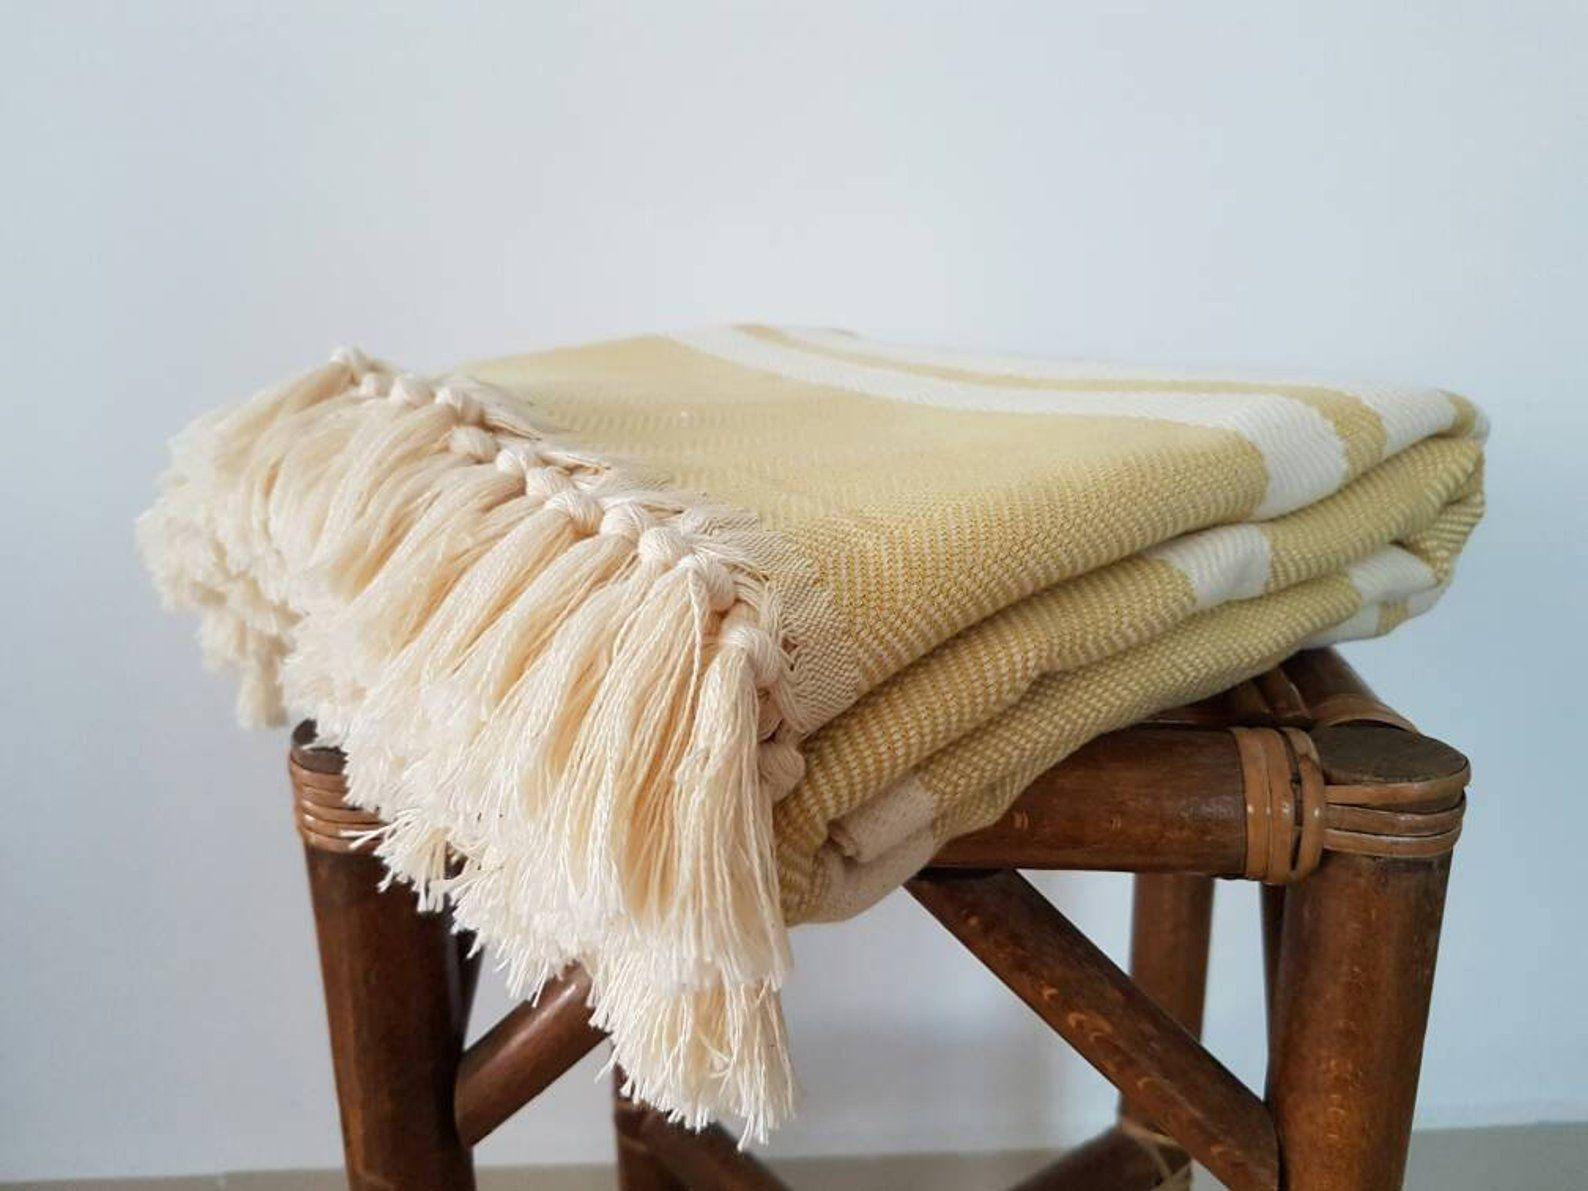 Mustard Herringbone Blanket 100 Cotton Woven Blanket Dijon Yellow Blanket Summer Coverlet Blanket With Fringes Cotton Bedspread Mustard Bedding Herringbone Blanket Blanket